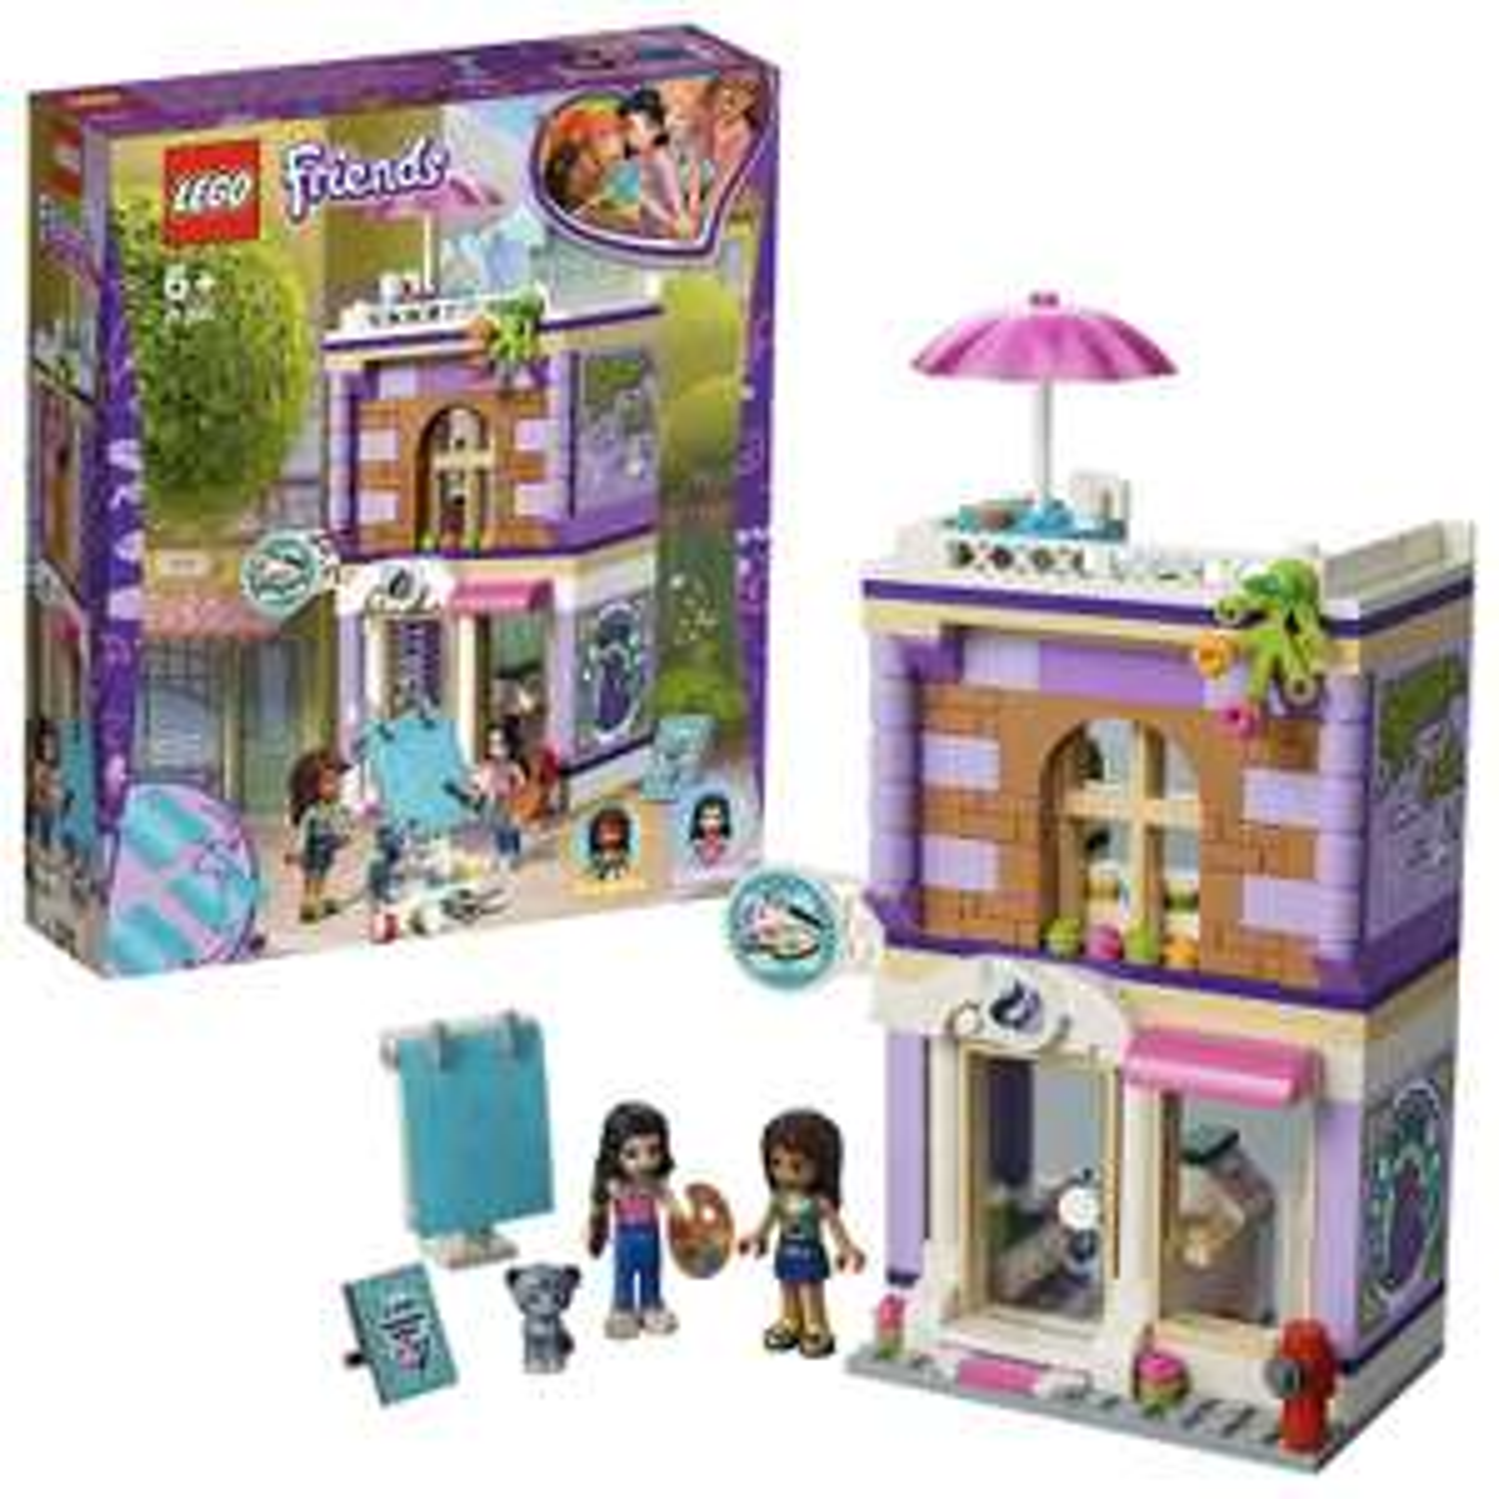 Lego Friends 41365 Emma's Art Studio Playset £12.99 (Prime) £17.48 (Non Prime) at Amazon